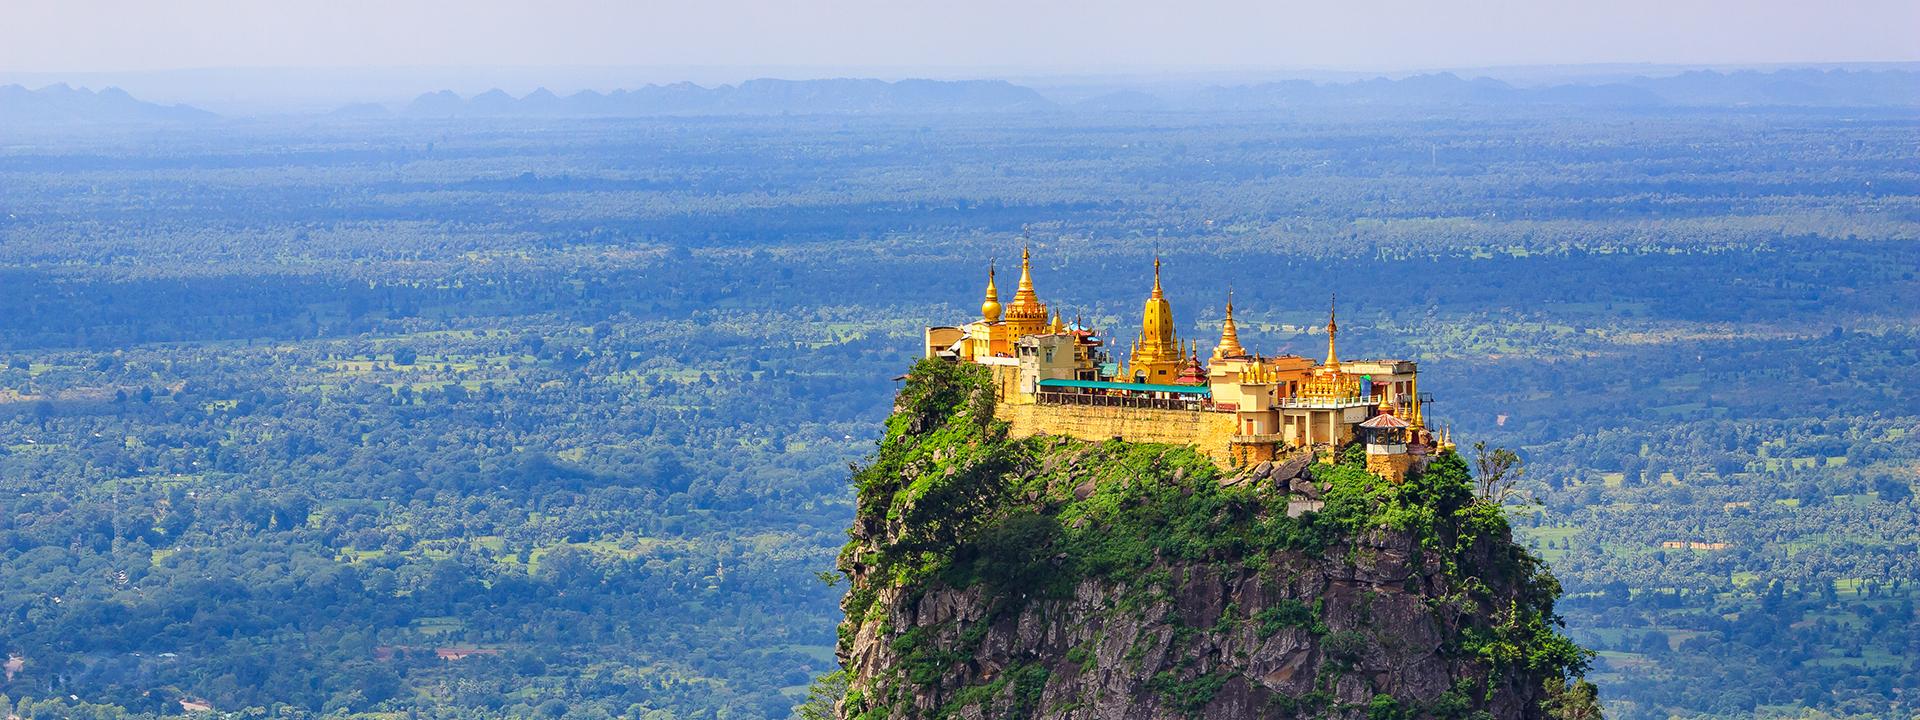 Top Things to Do in Bagan in 2019